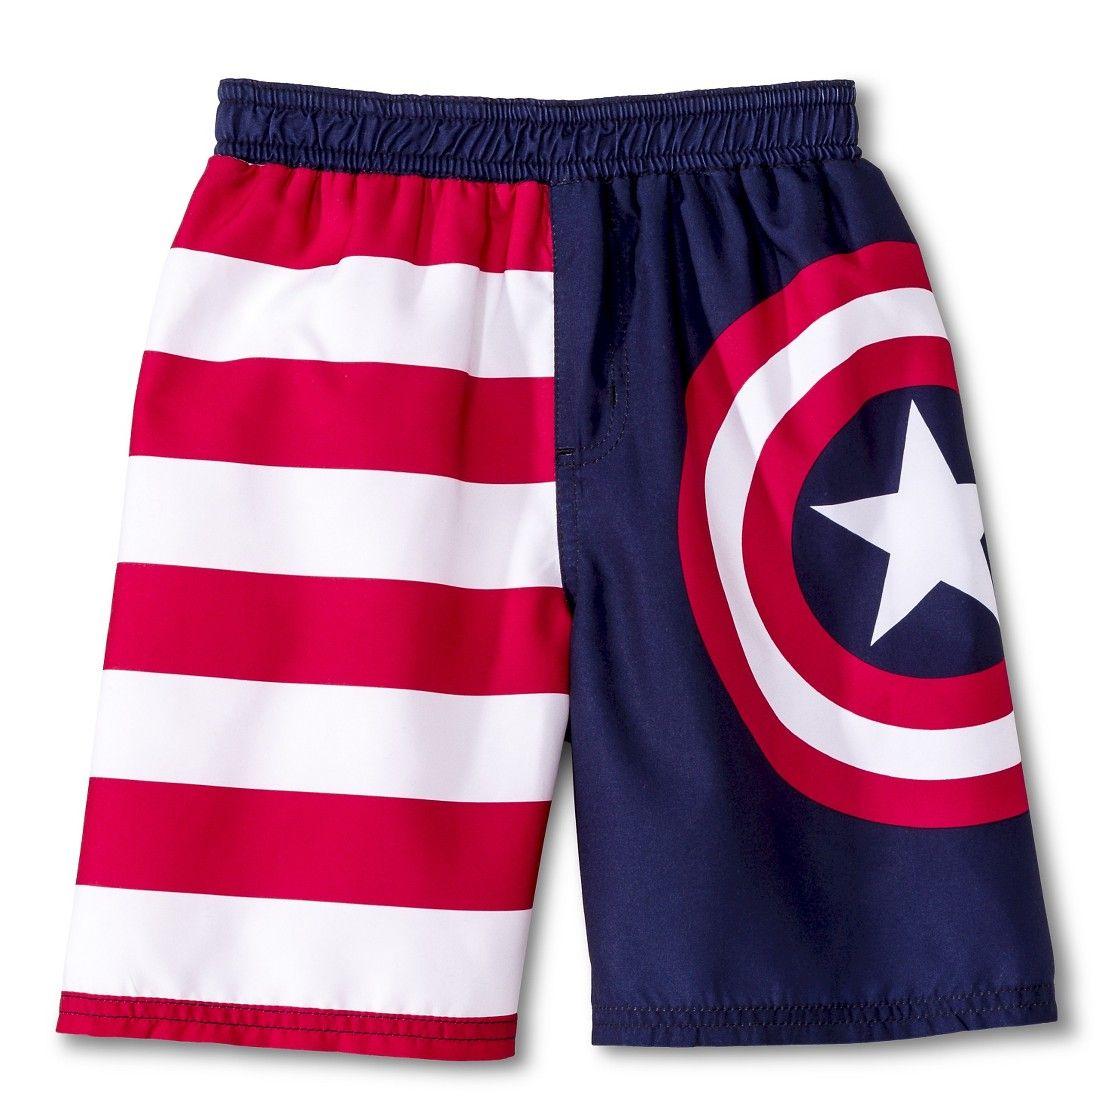 1b07df0c11 Toddler Boys' Captain America  Swim Trunks - Blue/Red | Clothes ...